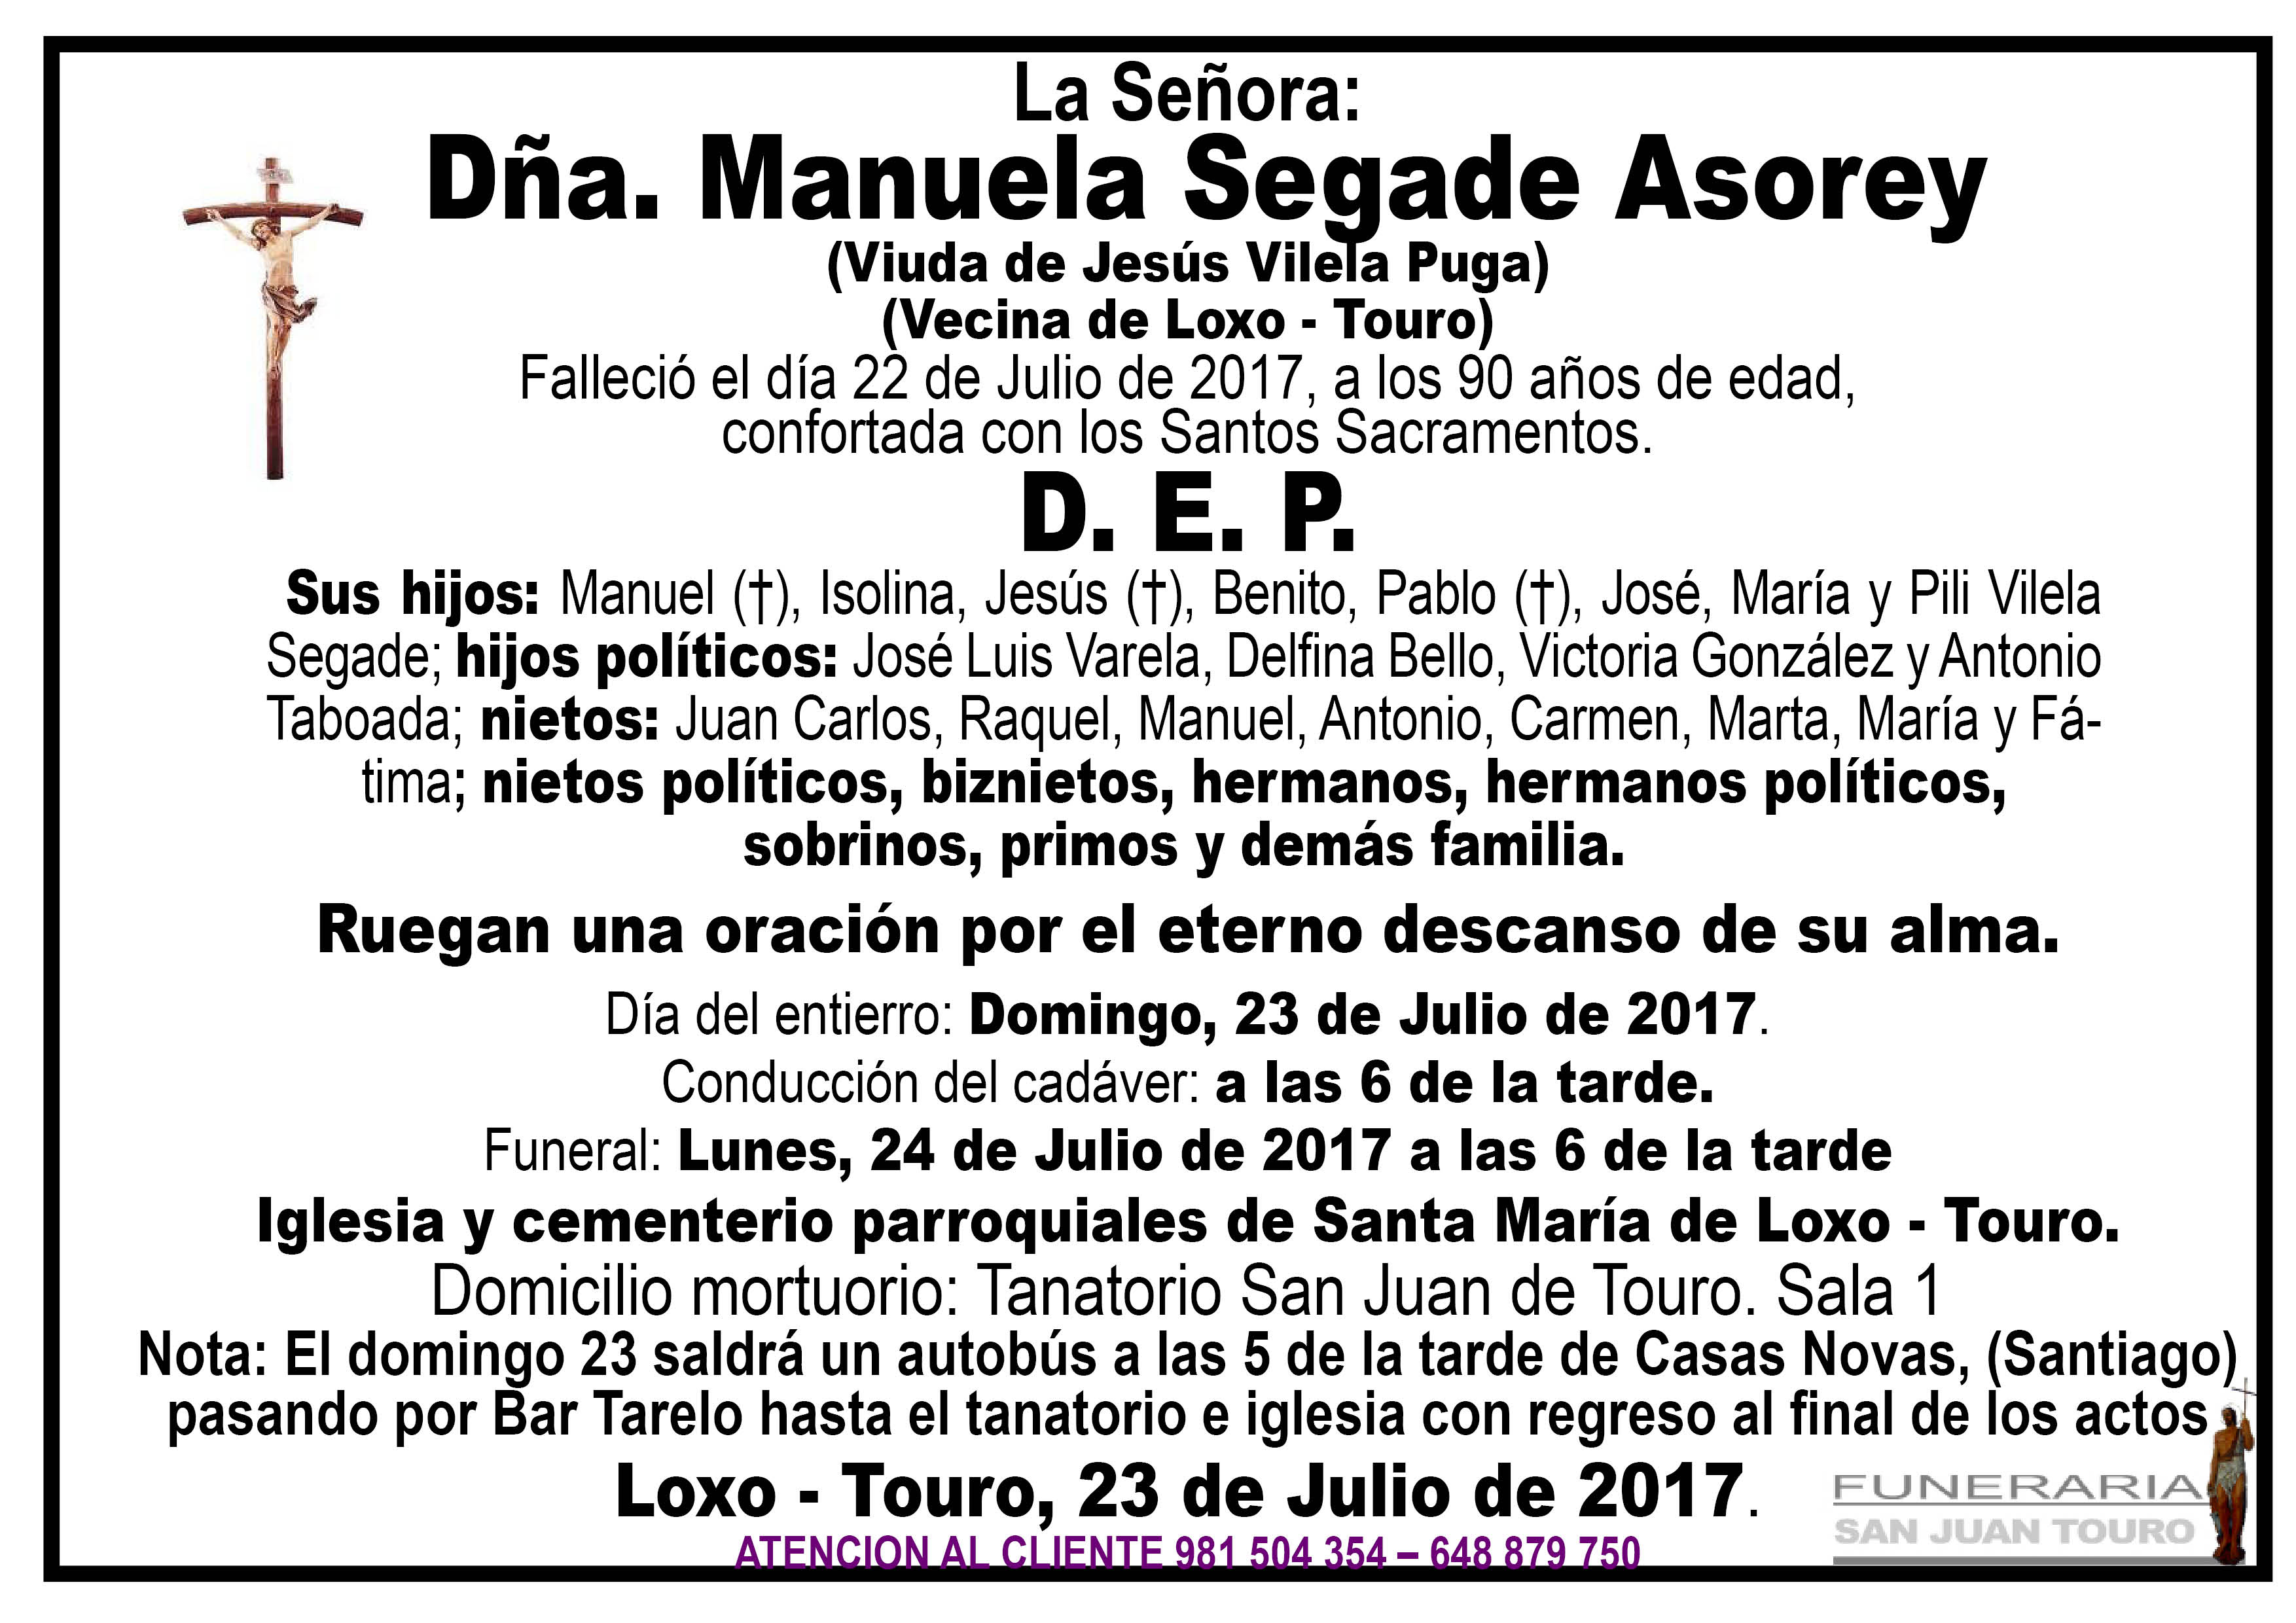 Esquela de SEPELIO DE DÑA. MANUELA SEGADE ASODEY